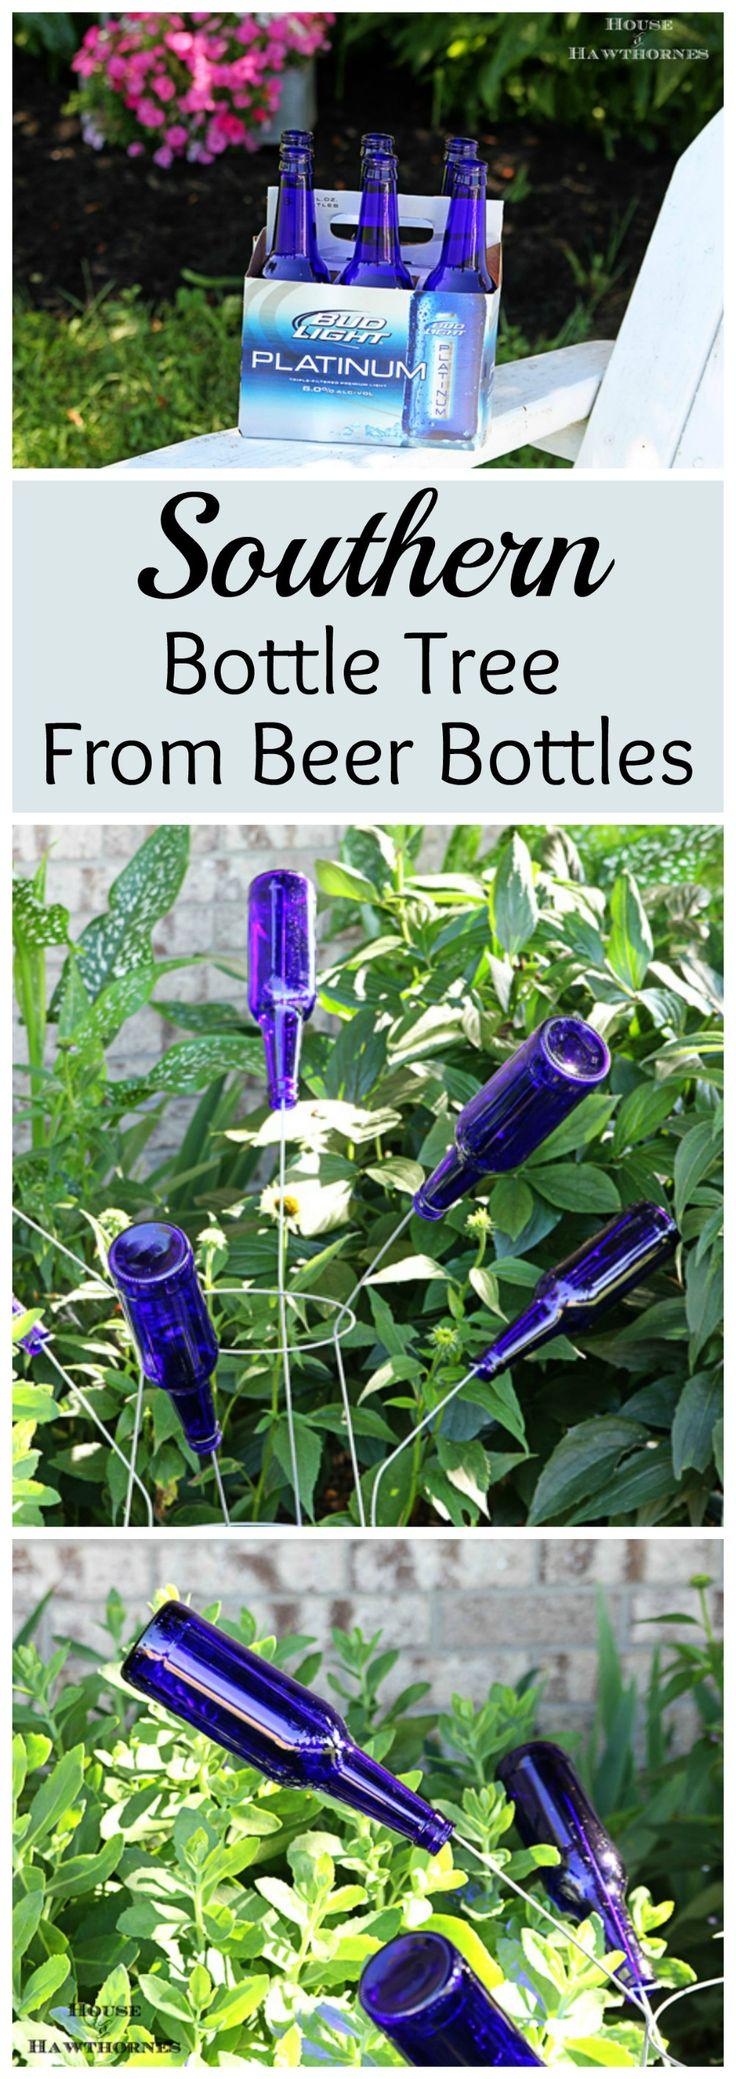 484 best Bottle trees and color glass art images on Pinterest | Blue ...